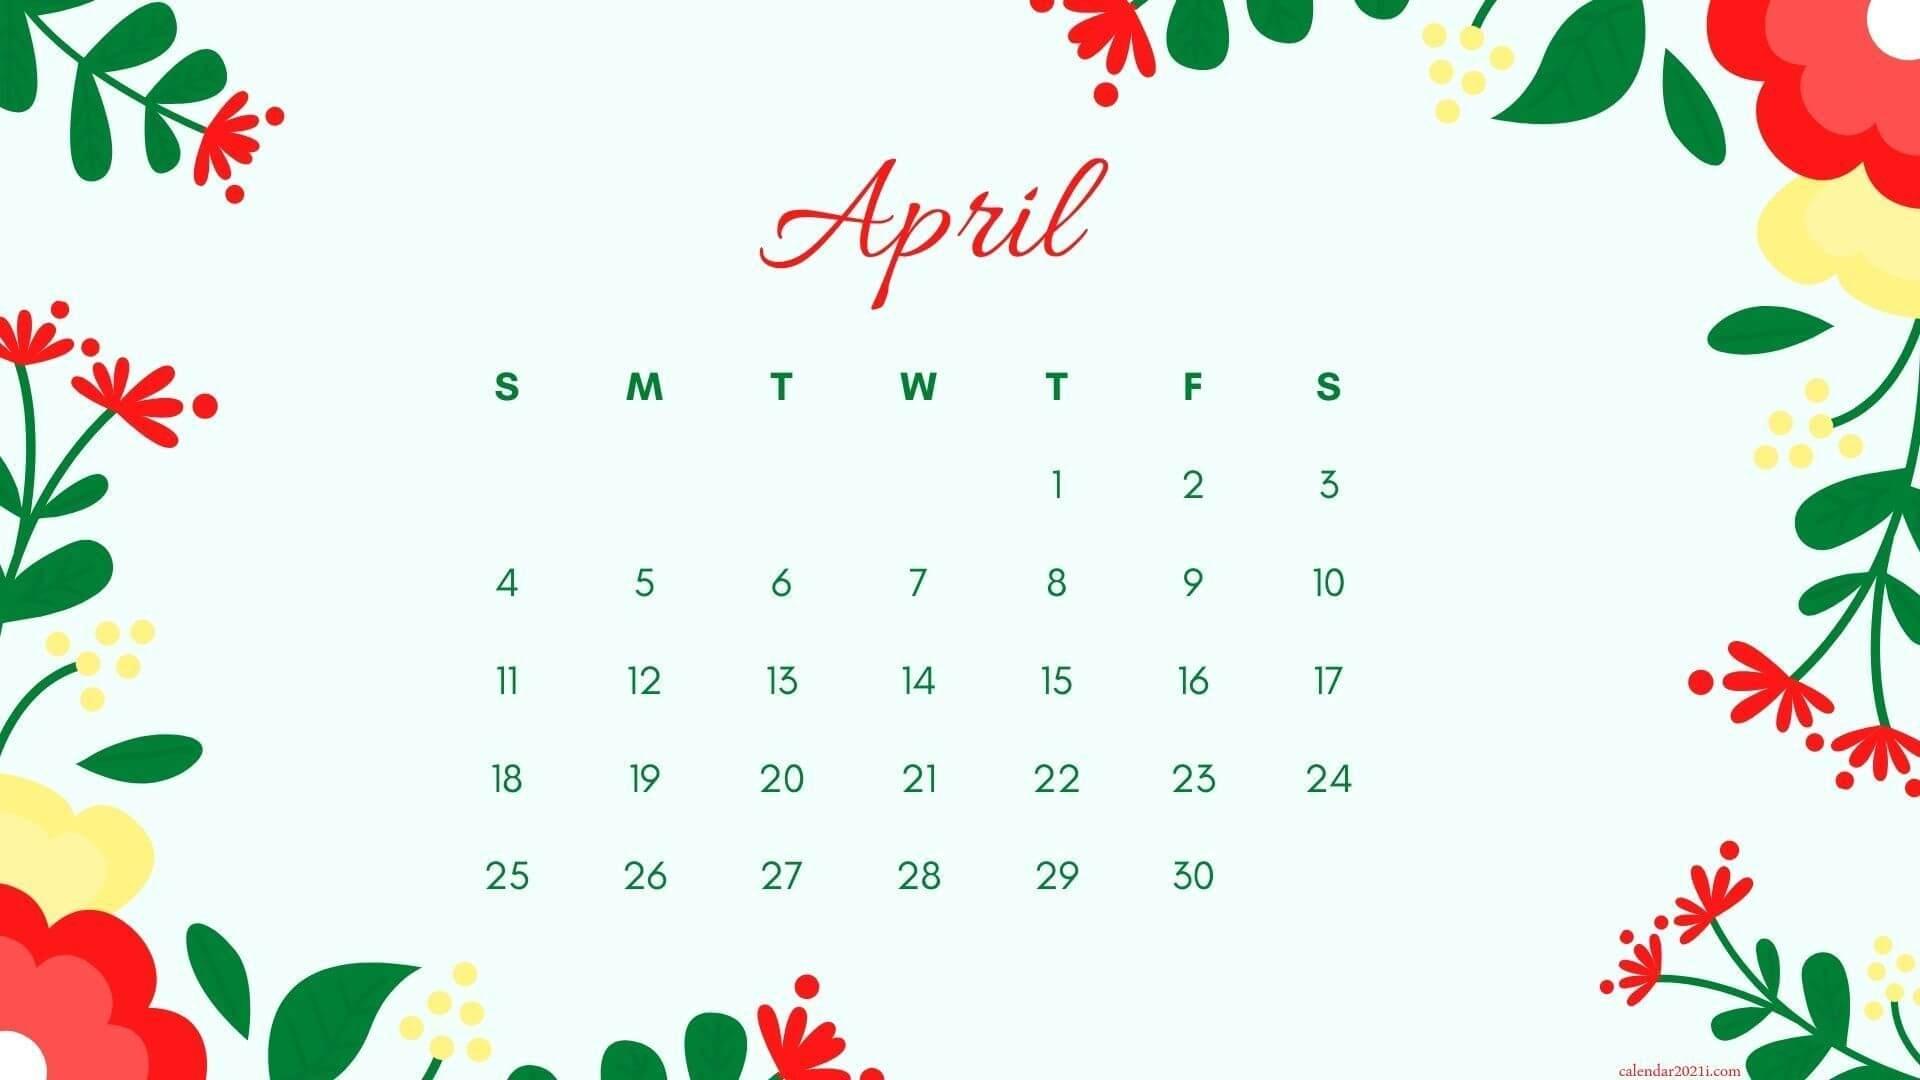 Floral April 2021 Calendar Wallpaper for Desktop